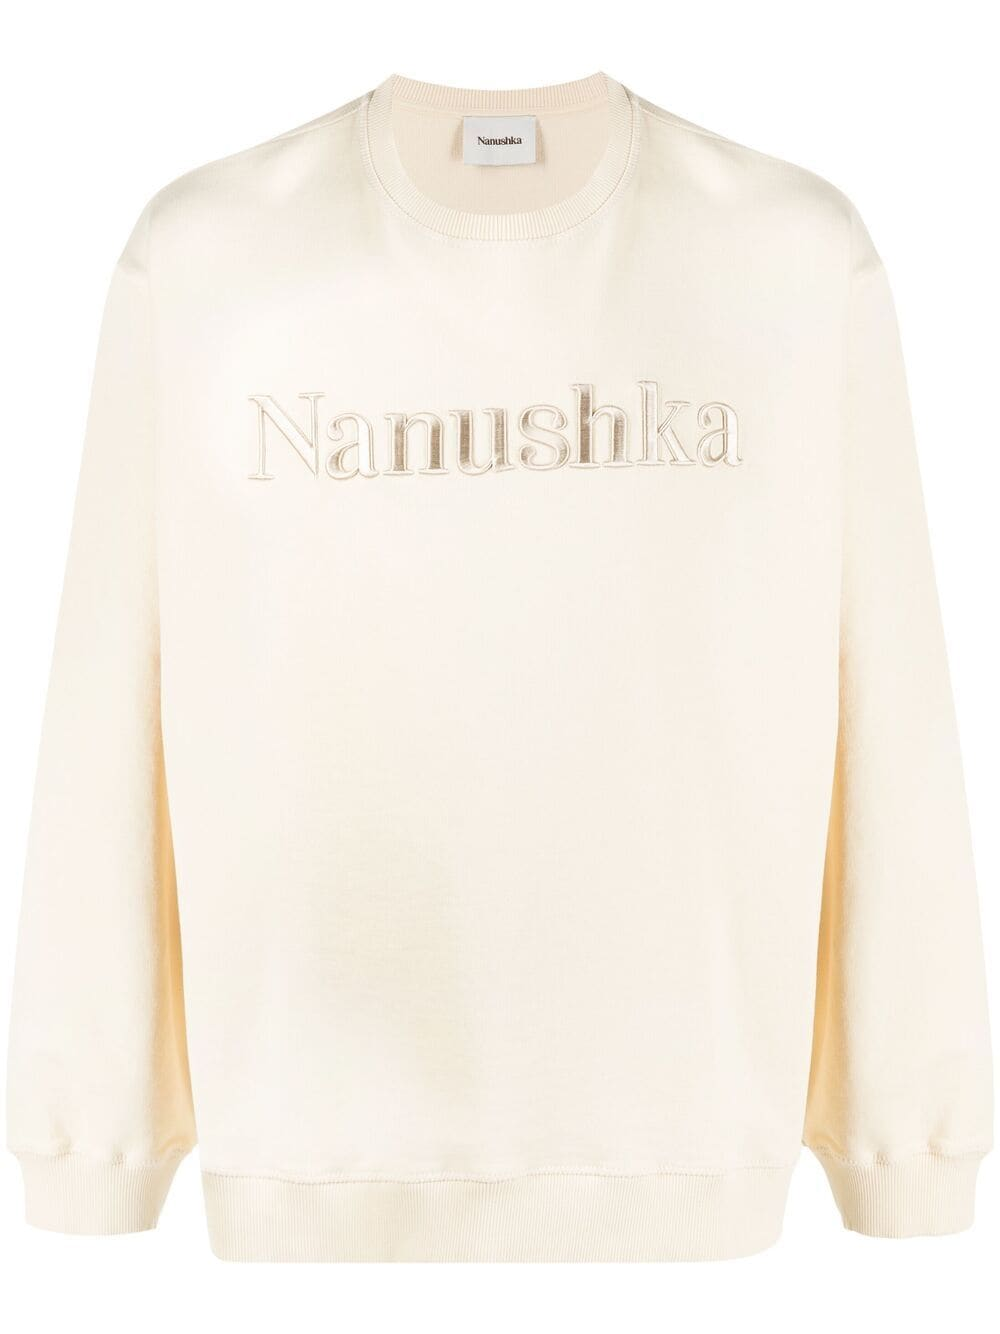 <p class='small-title'>NANUSHKA</p>Sweatshirt